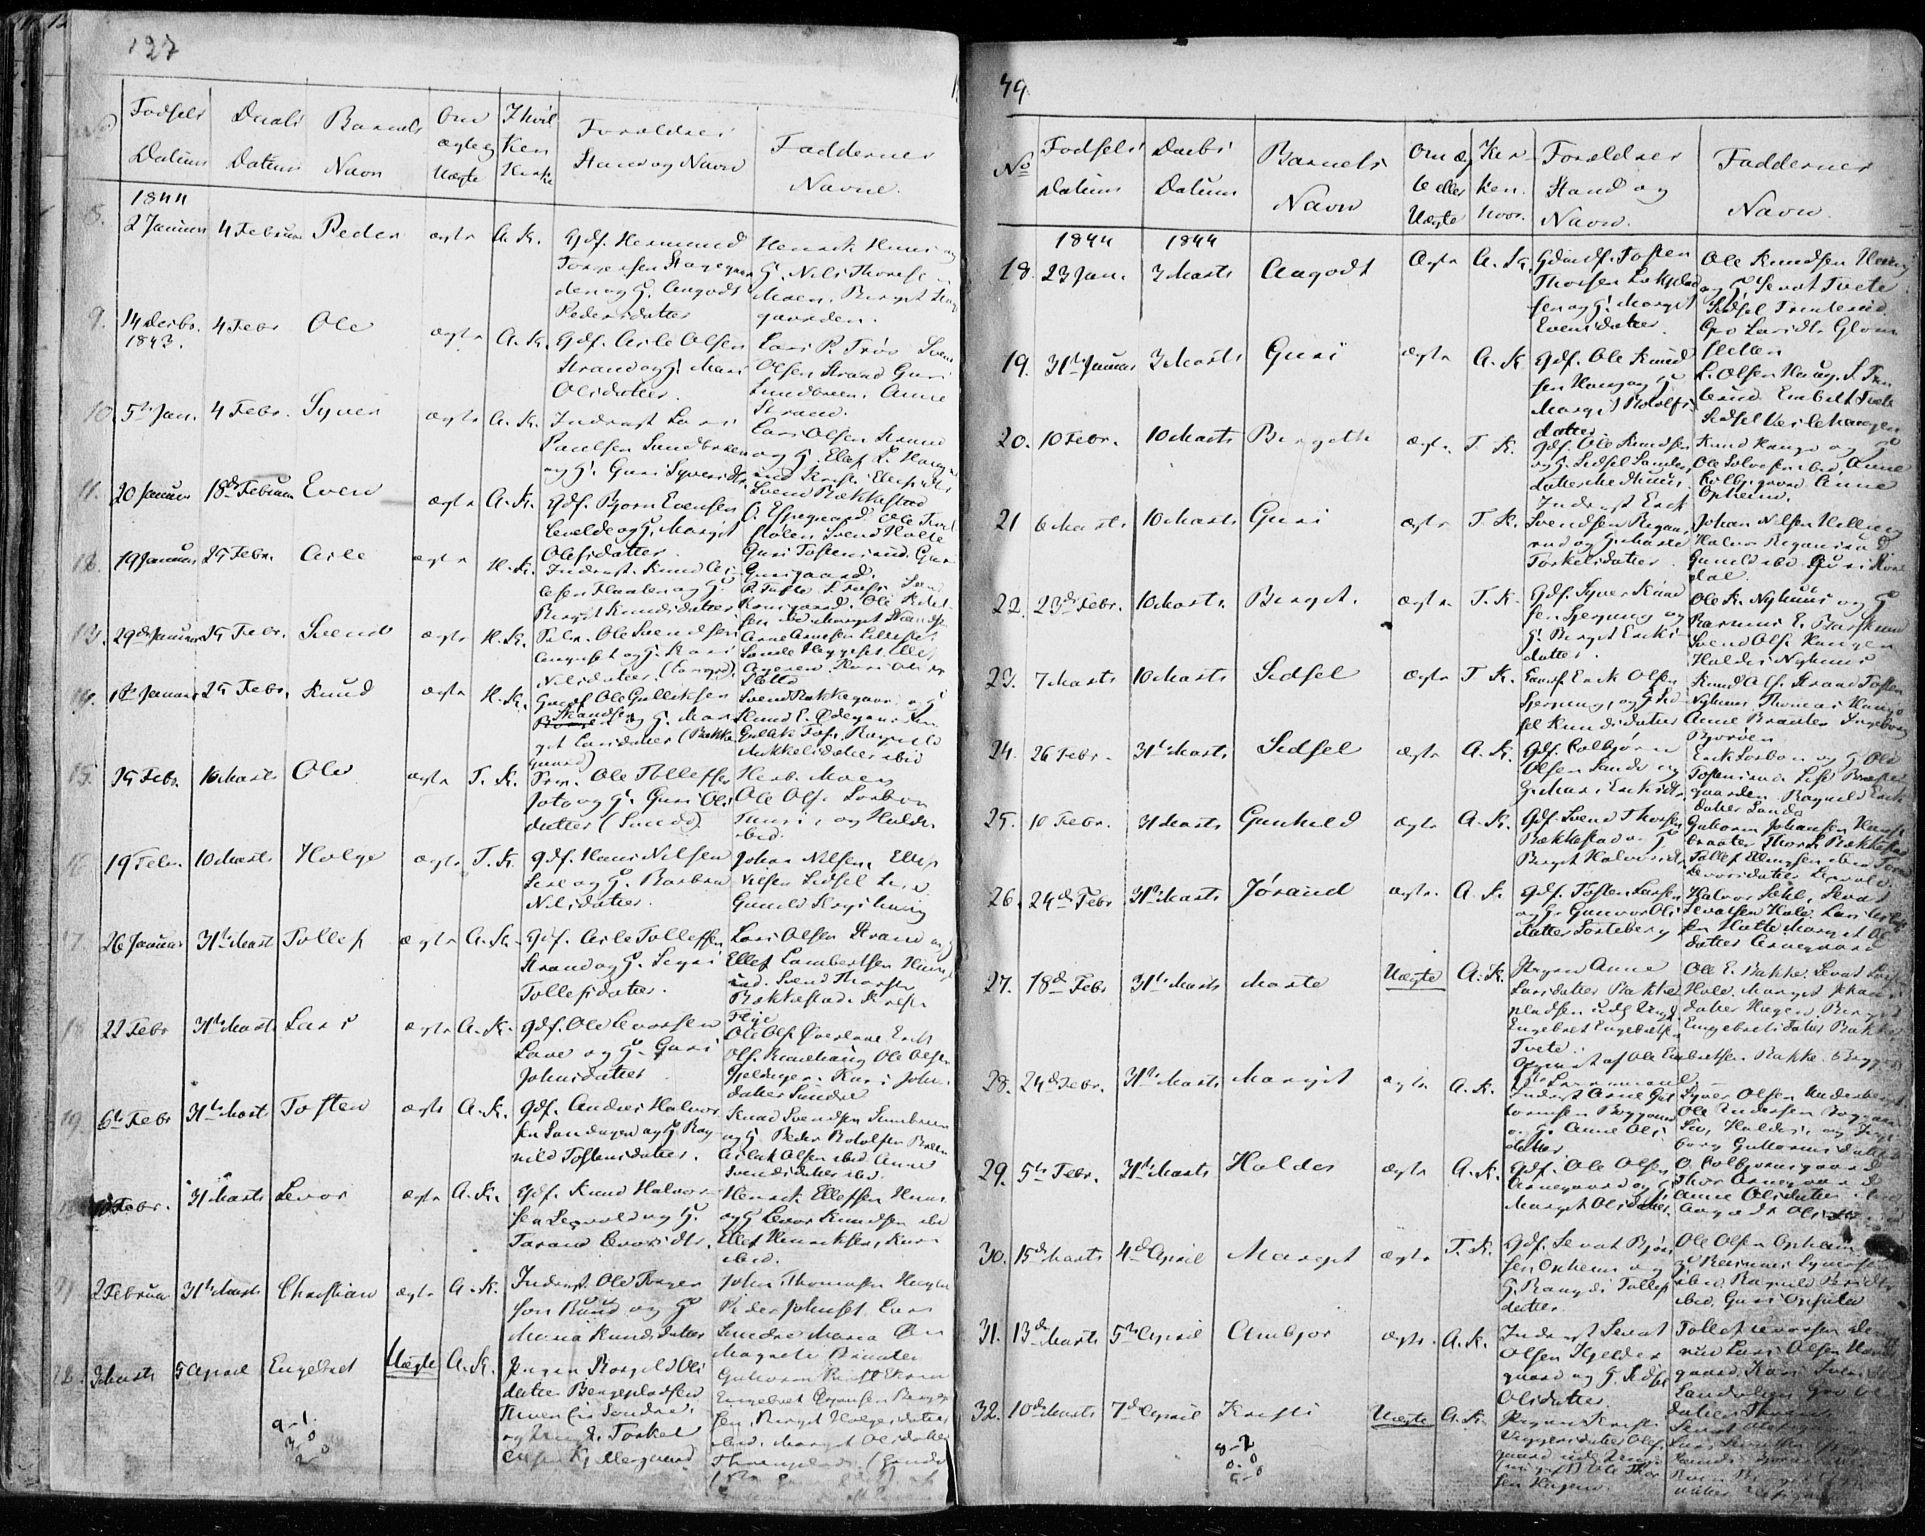 SAKO, Ål kirkebøker, F/Fa/L0005: Parish register (official) no. I 5, 1825-1848, p. 127